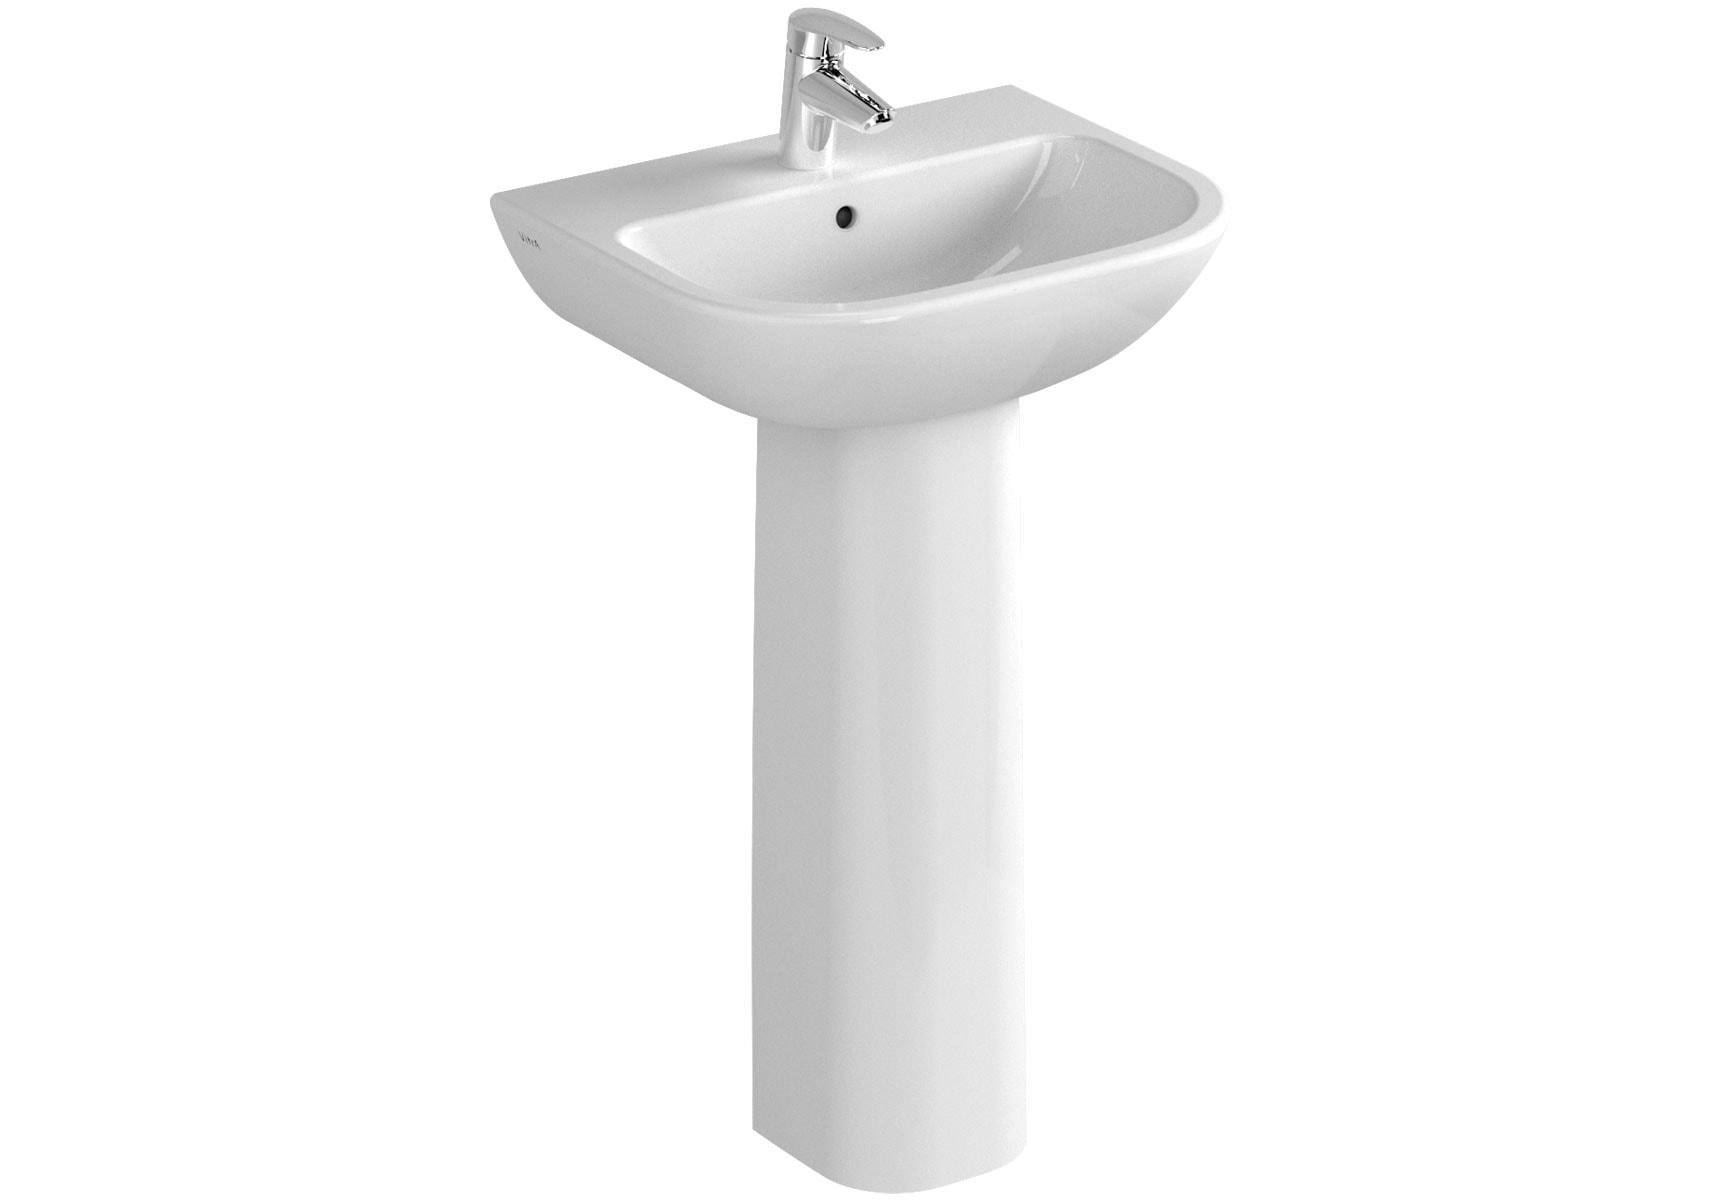 S20 Basin, 50cm